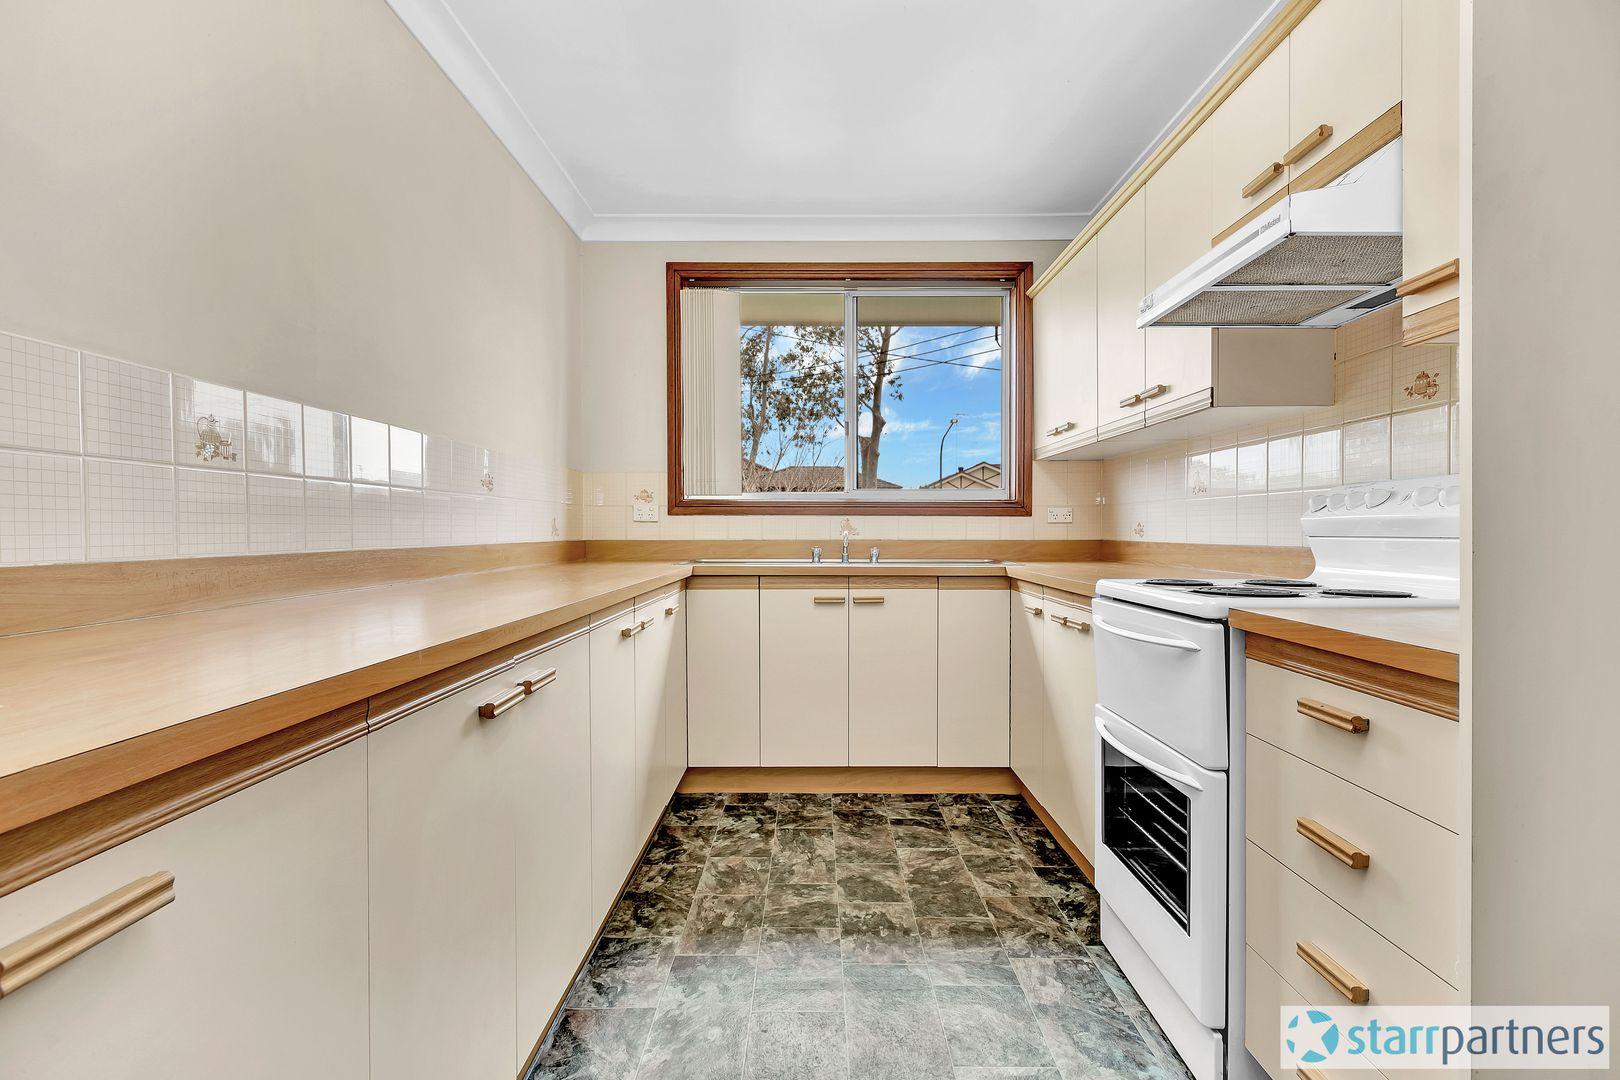 1/10 Wolseley Rd, Mcgraths Hill NSW 2756, Image 1